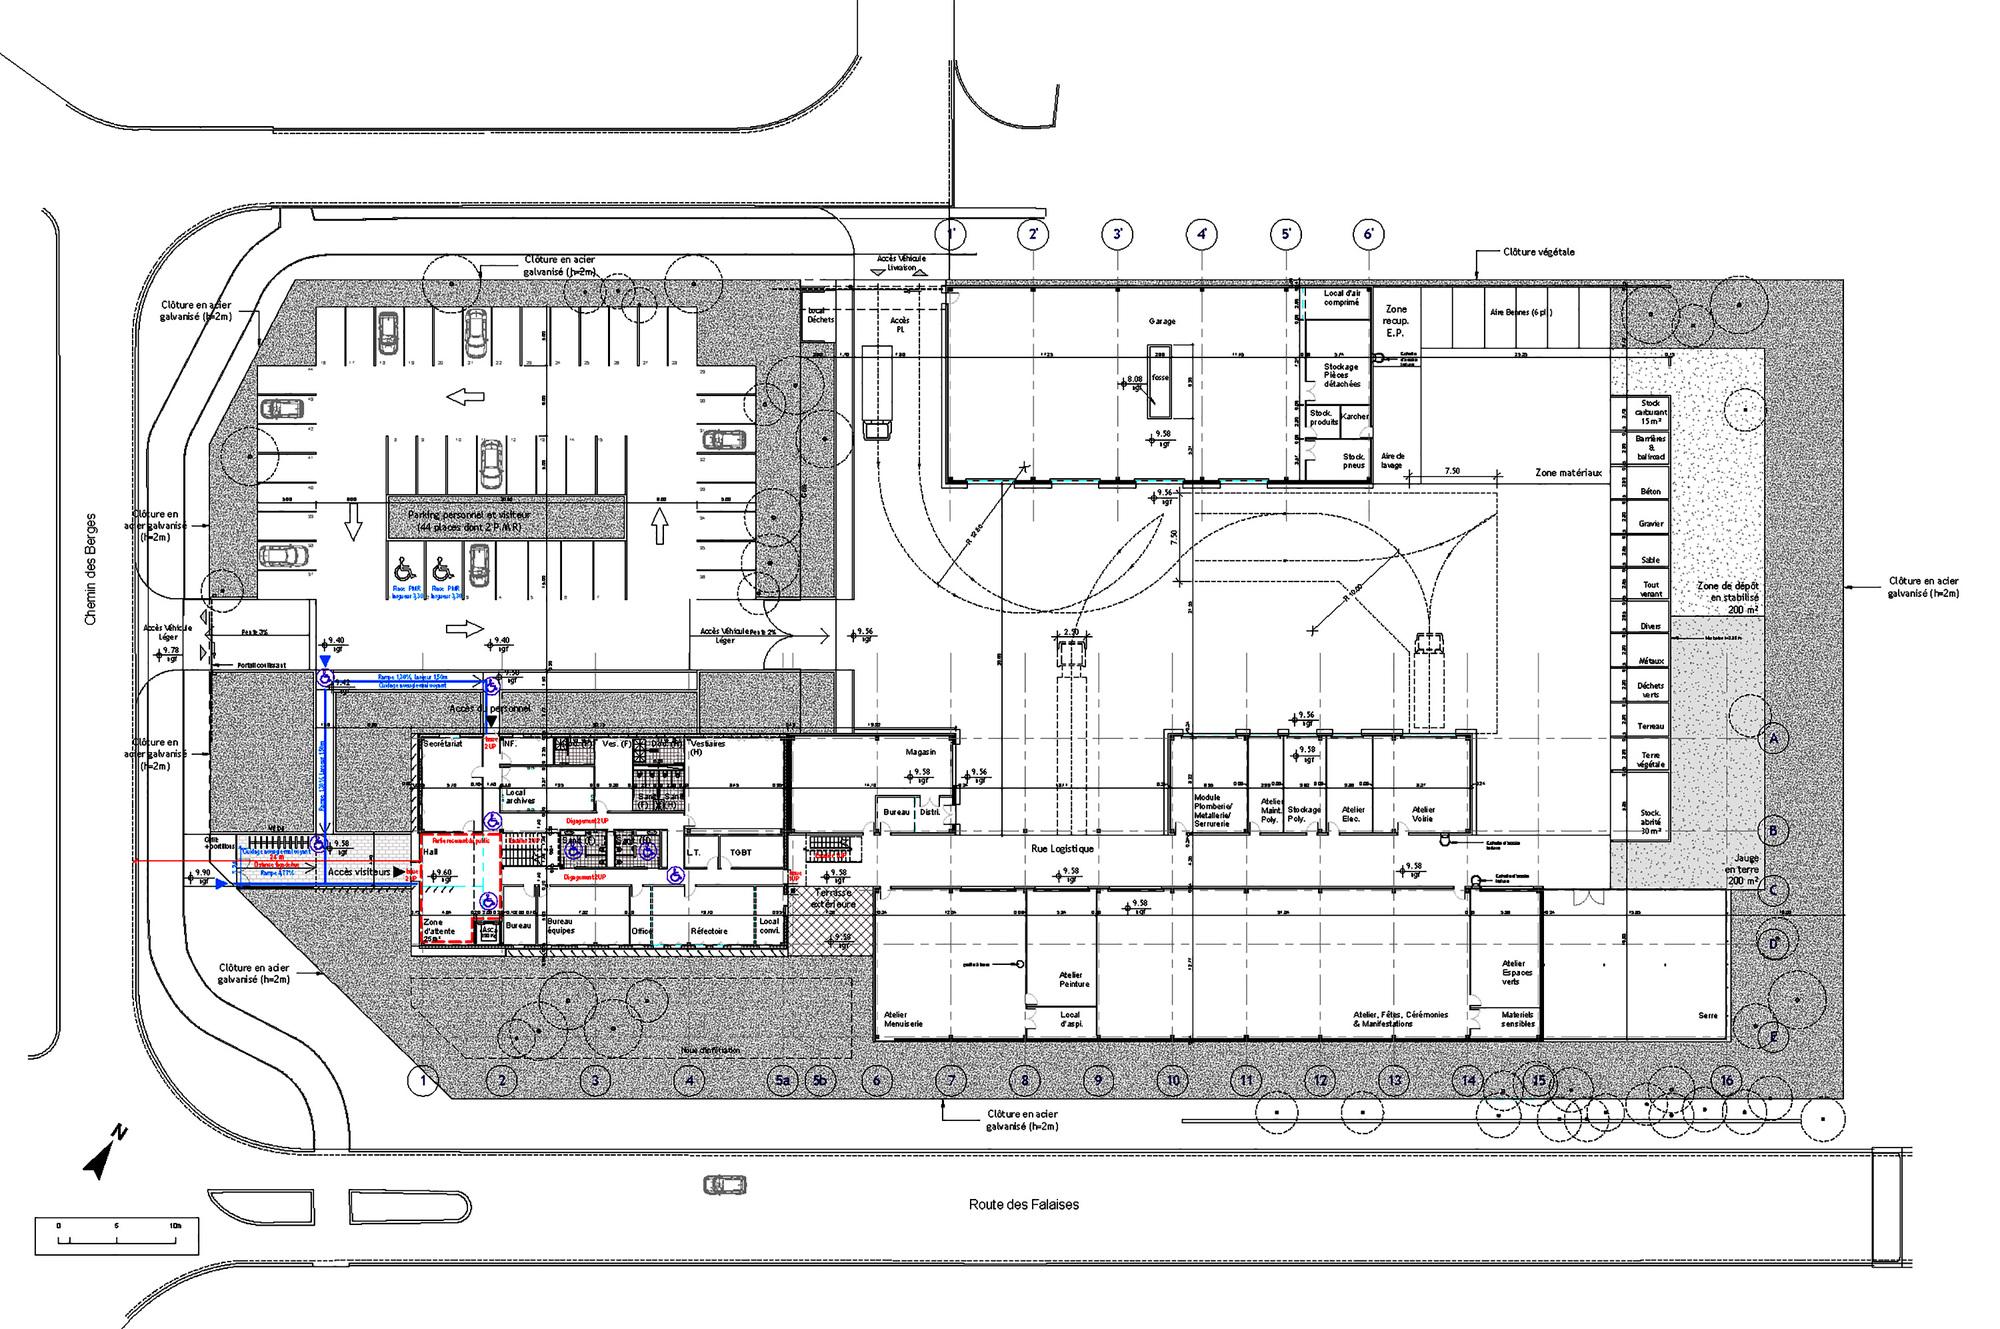 gallery of municipal technical center studios first floor plan townhall leeds historical interiors